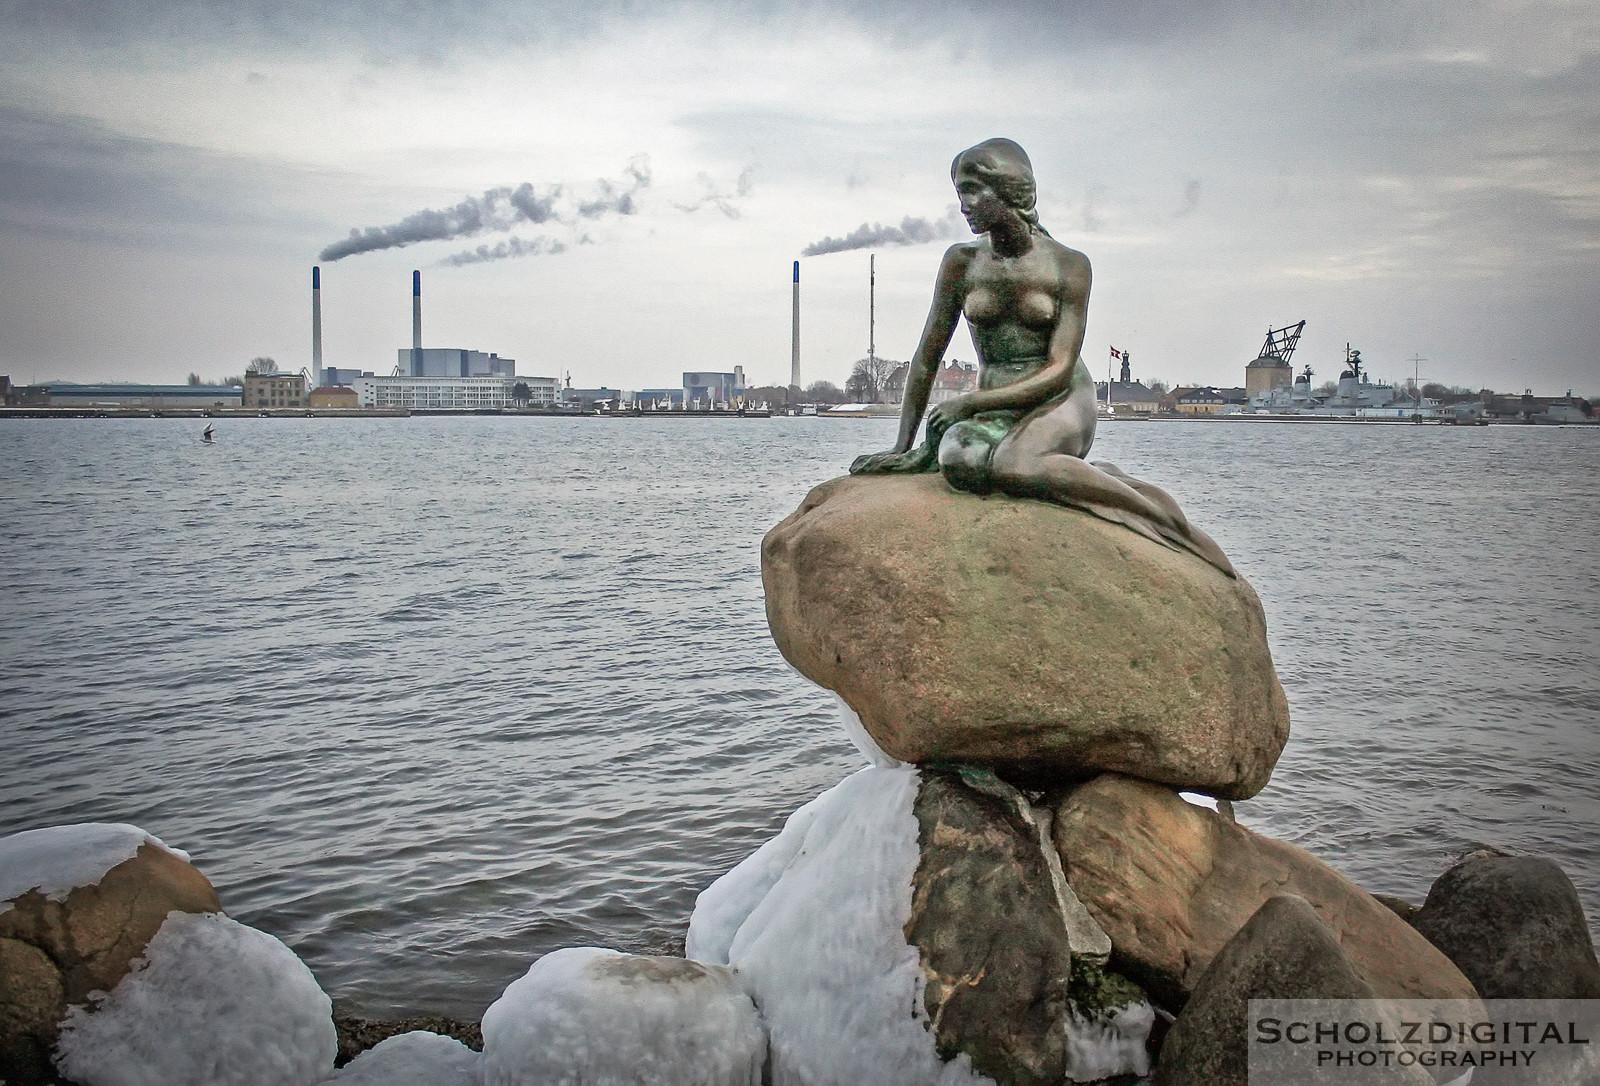 Kopenhagen, Meerjungfrau, Dänemark, Fotografie, Städtereisen, Sightseeing, Scholzdigital